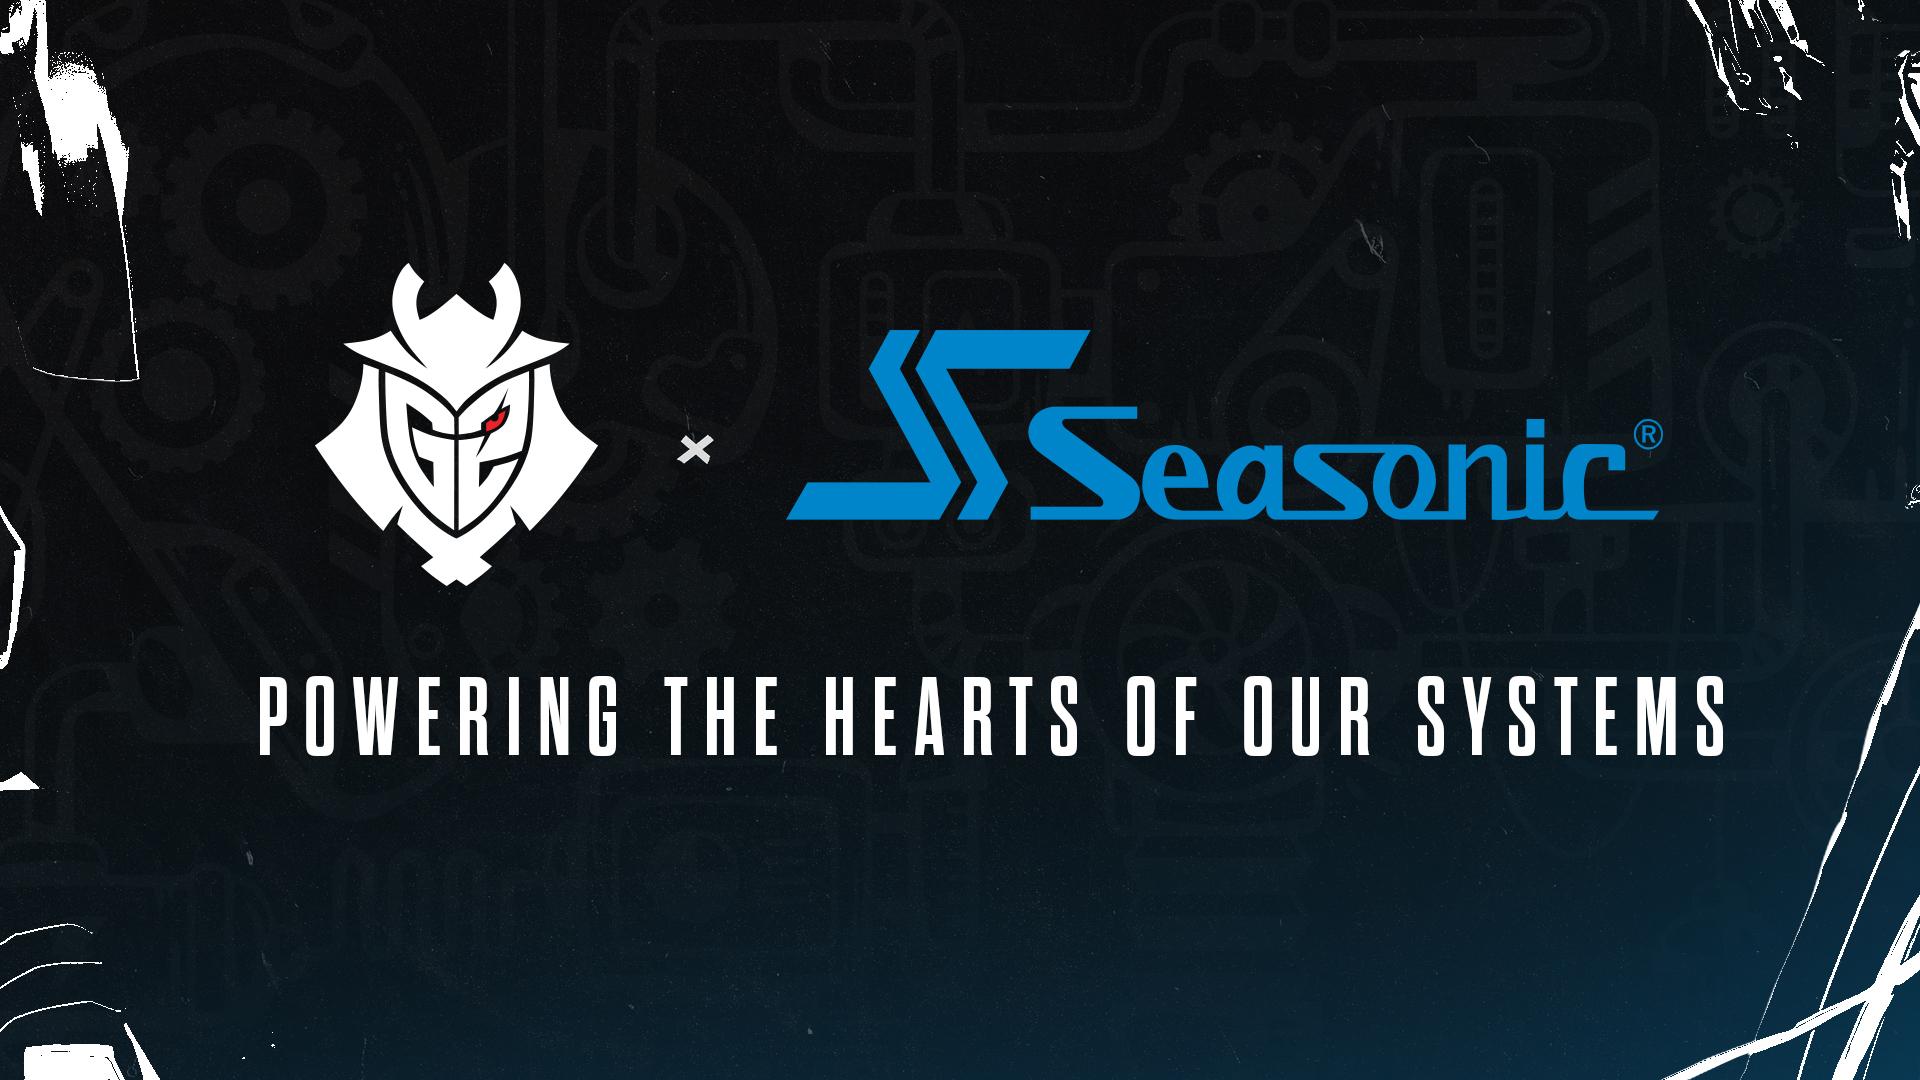 Seasonic - G2 Partnership